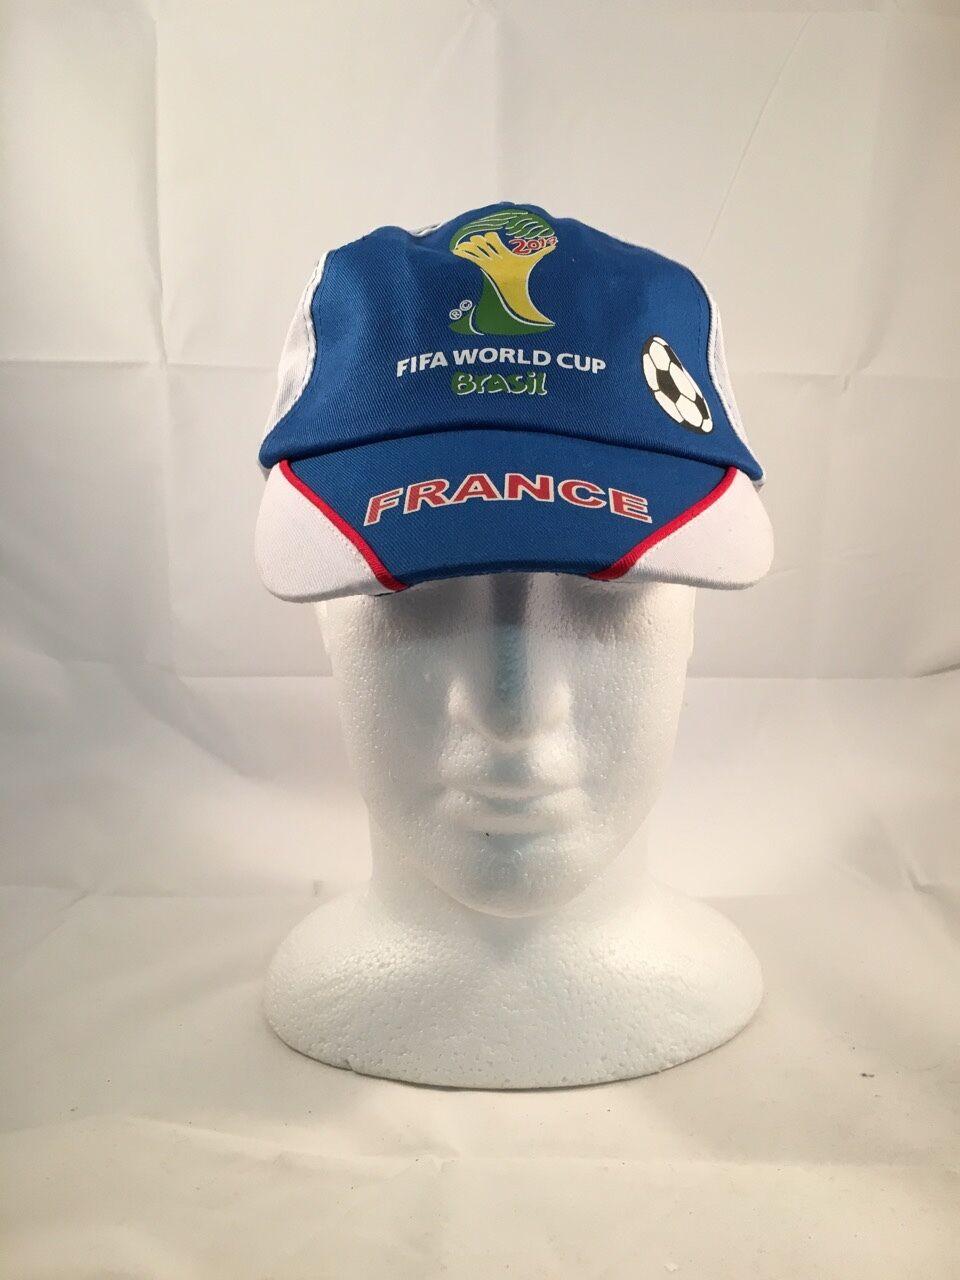 FRANCE - 2014 FIFA TAGS WORLD CUP BRAZIL WITH TAGS FIFA - Baseball Cap H10 7fce4f